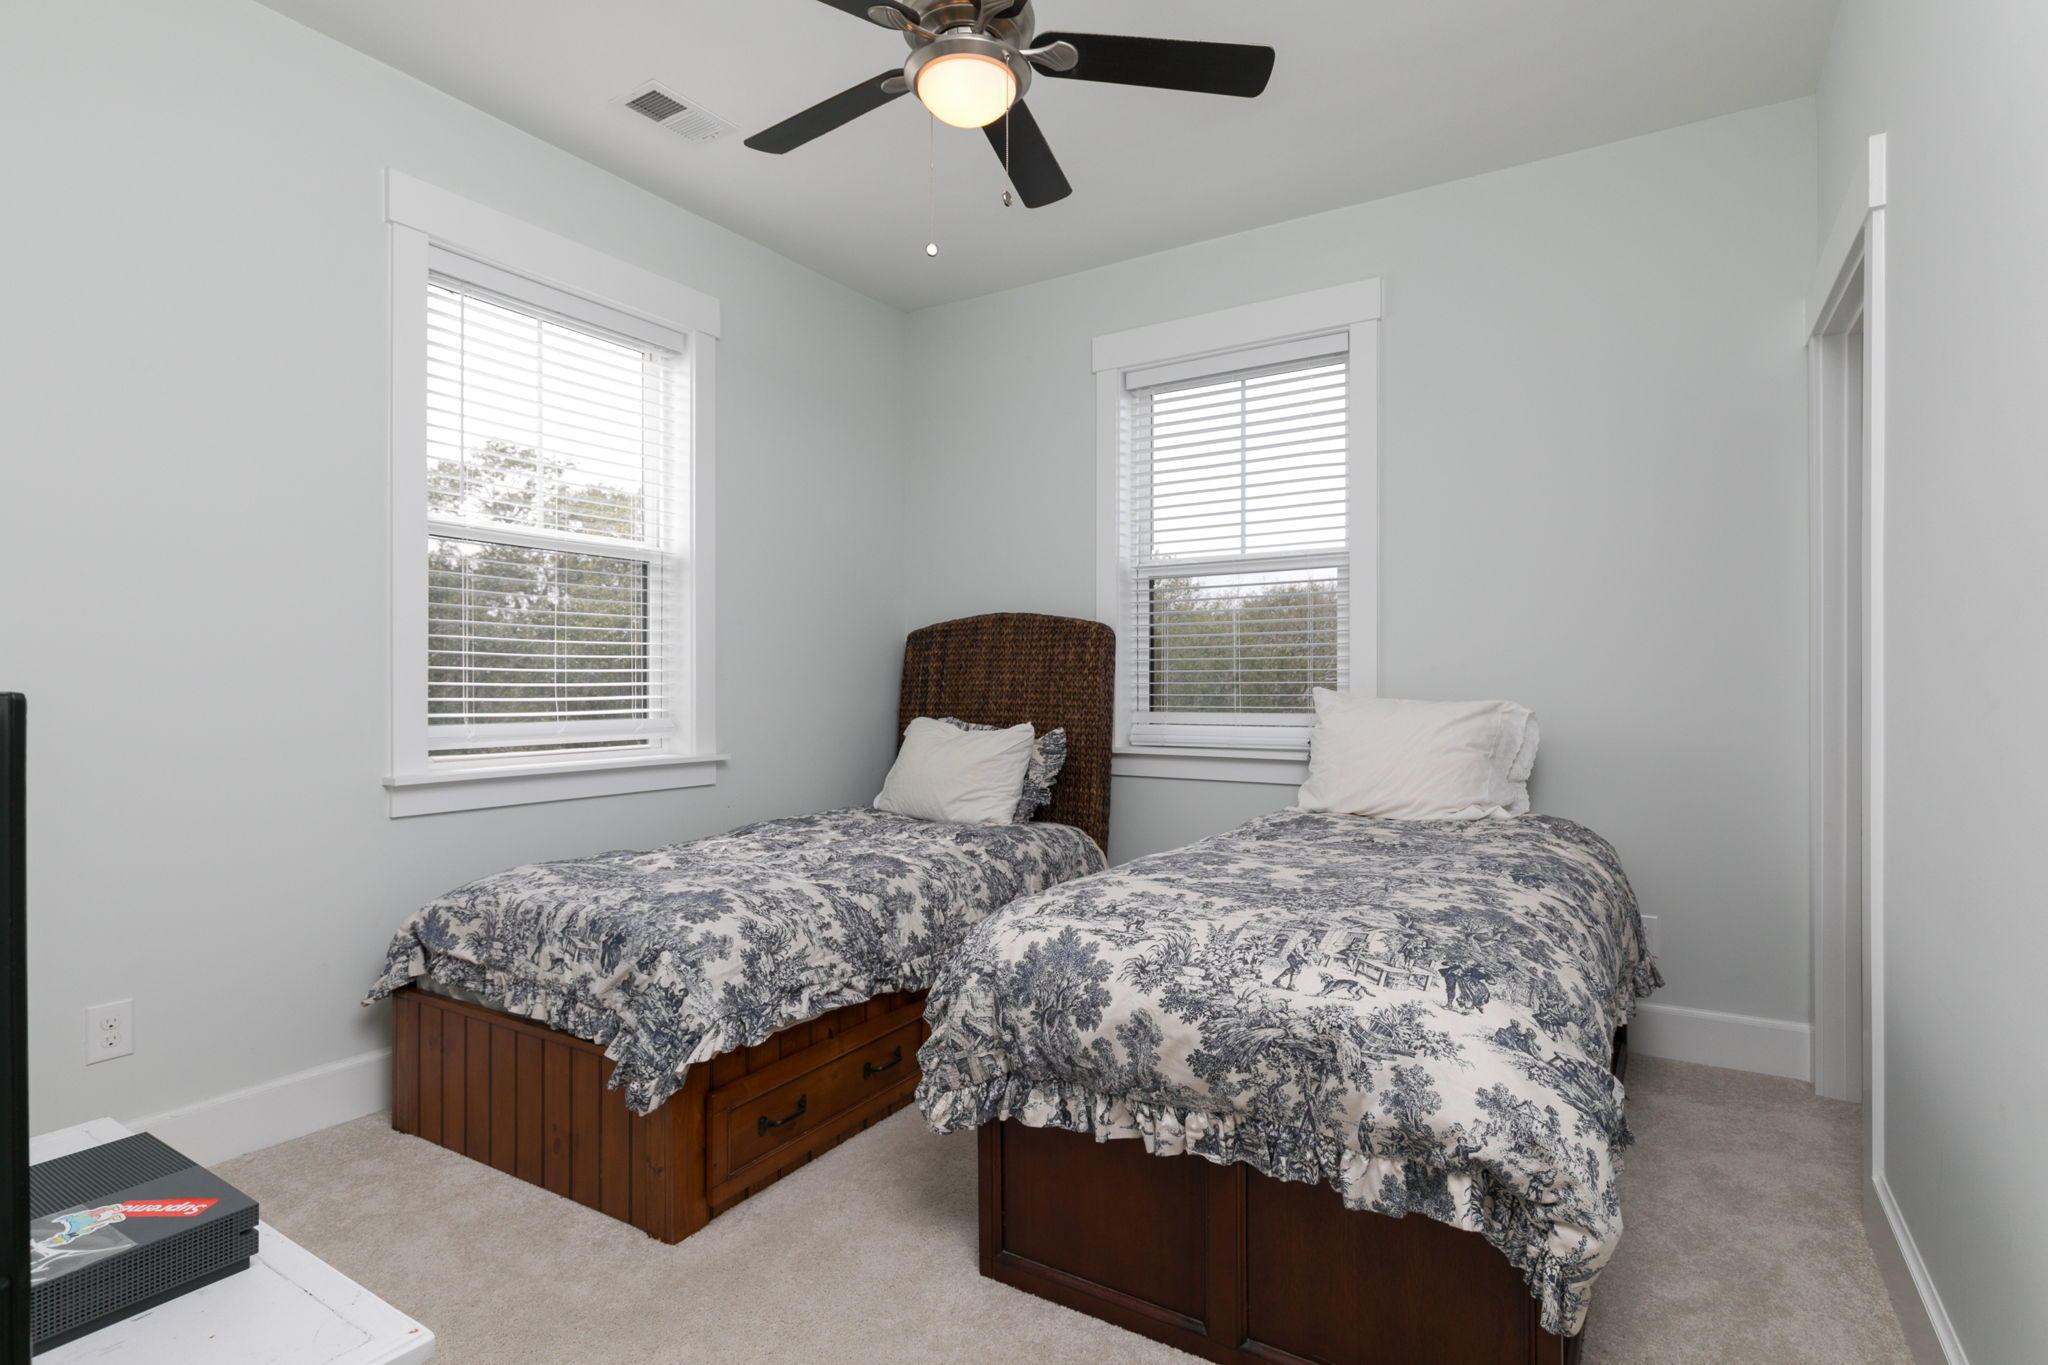 Sullivans Pointe Homes For Sale - 954 Key Colony, Mount Pleasant, SC - 10